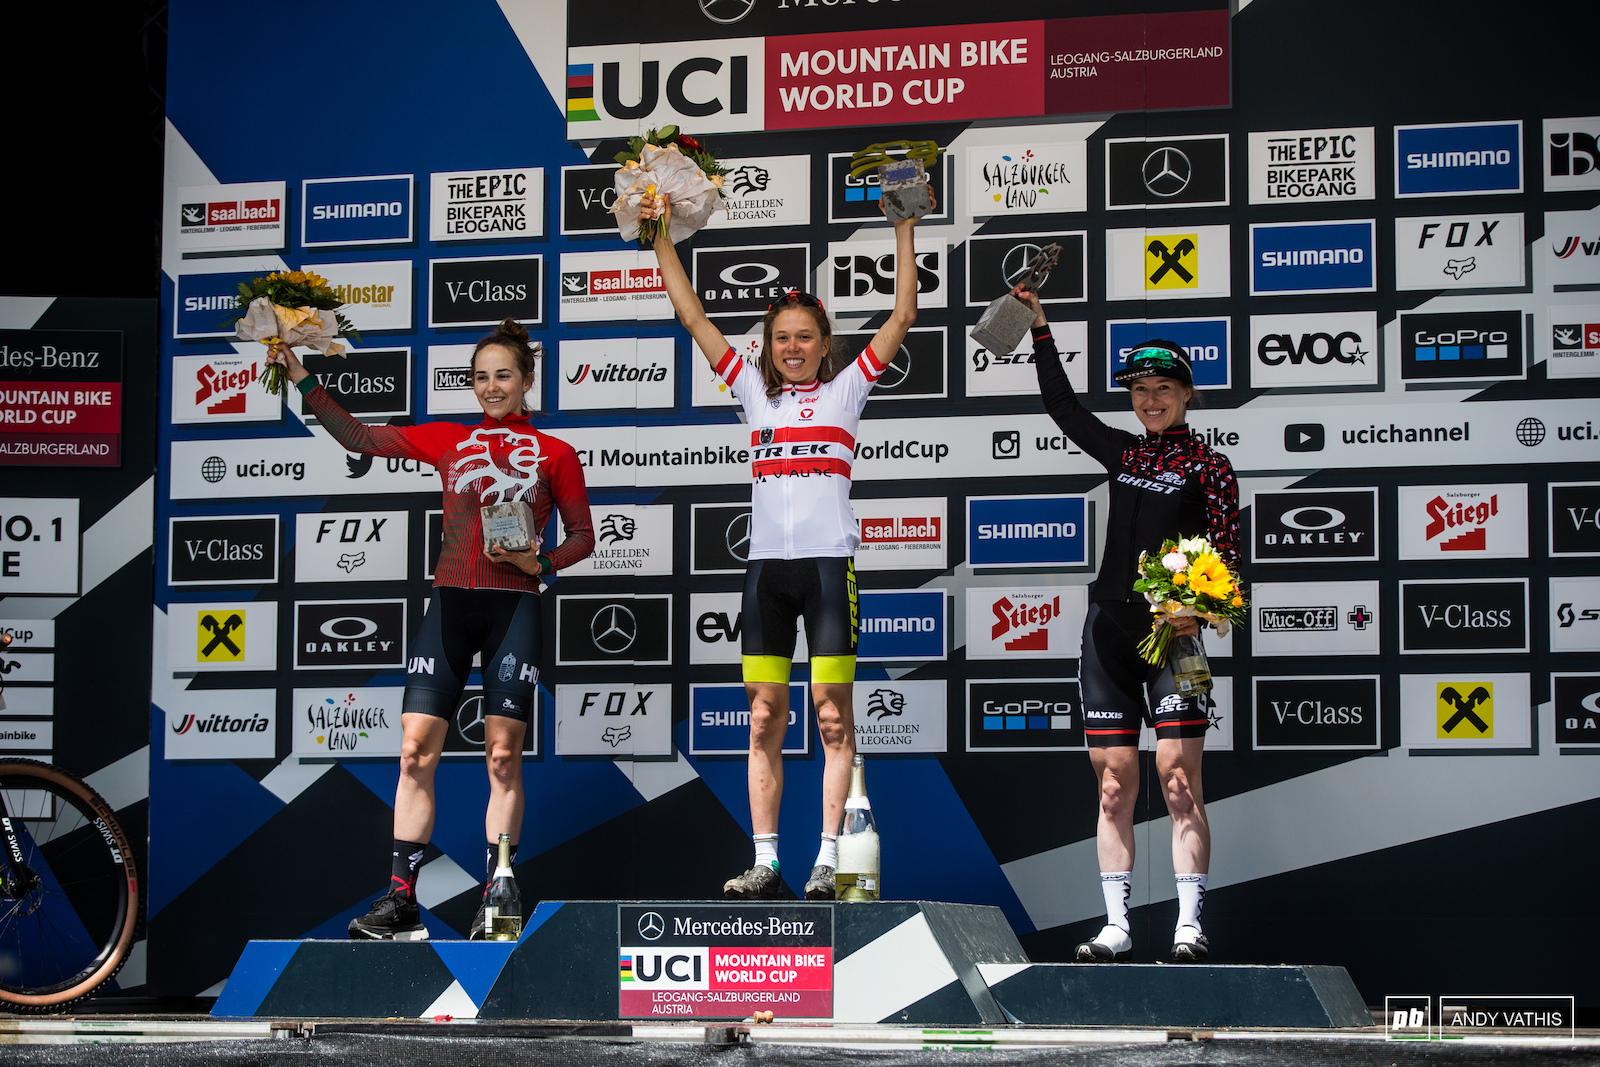 Your top 3 U23 women 1st Mona Mitterwallner 2nd Kata Blanka Vas and 3rd Caroline Bohe